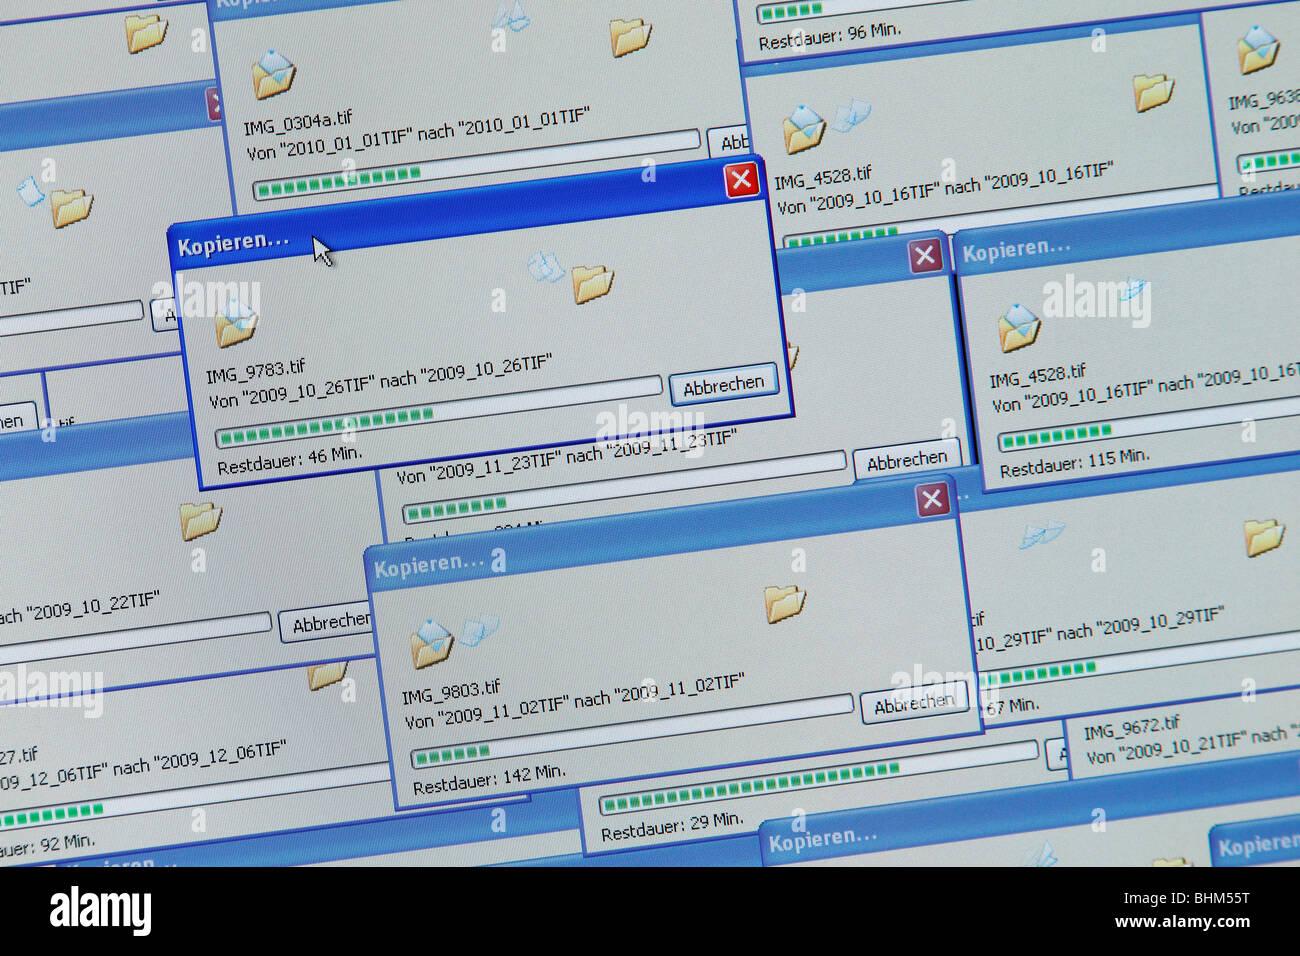 copy images in Windows (German language) - Stock Image